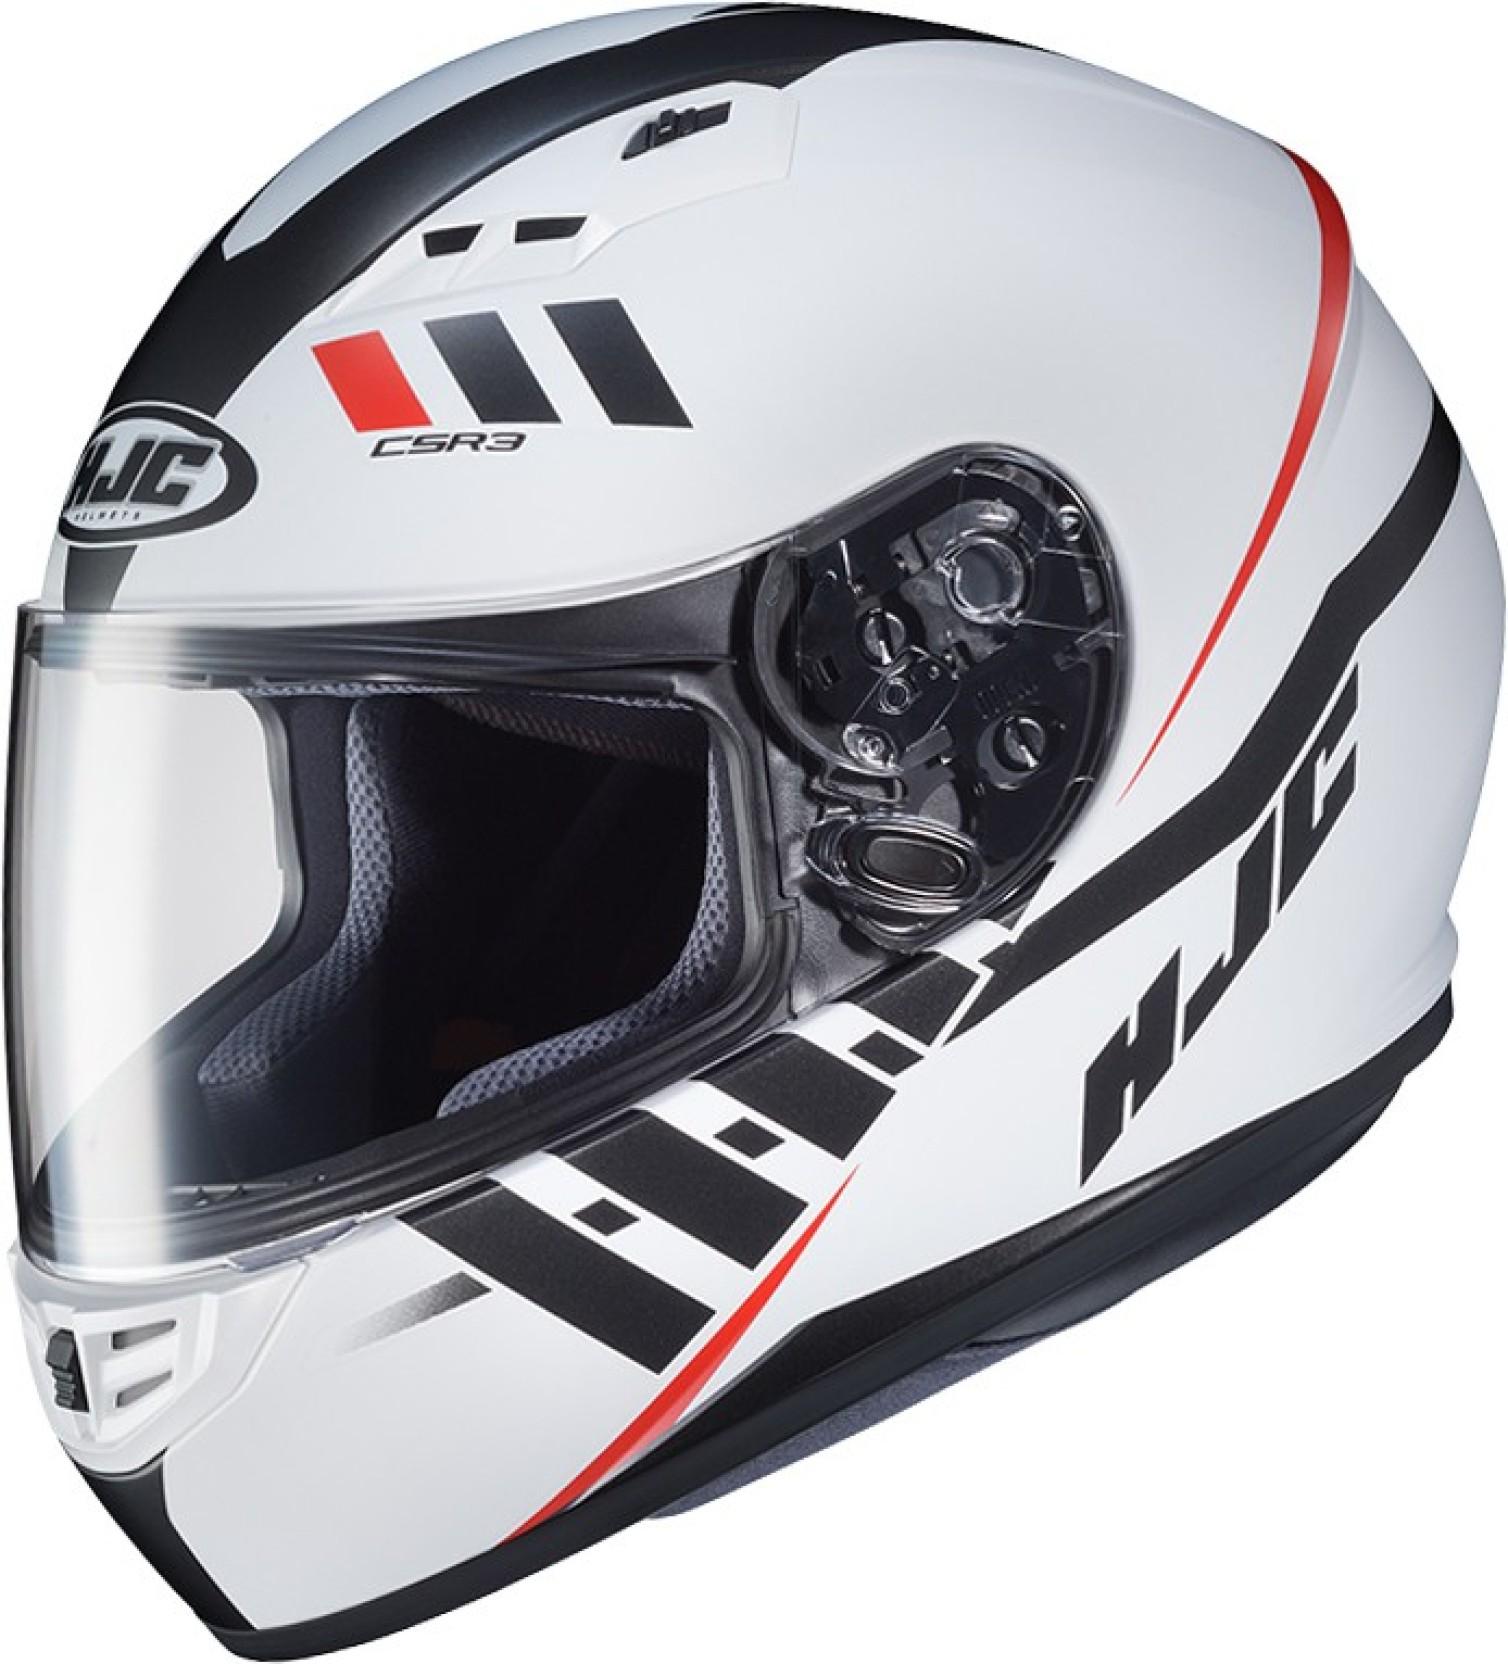 lowest price d5759 4db82 HJC SPACE MC10SF Motorbike Helmet (White, Red)